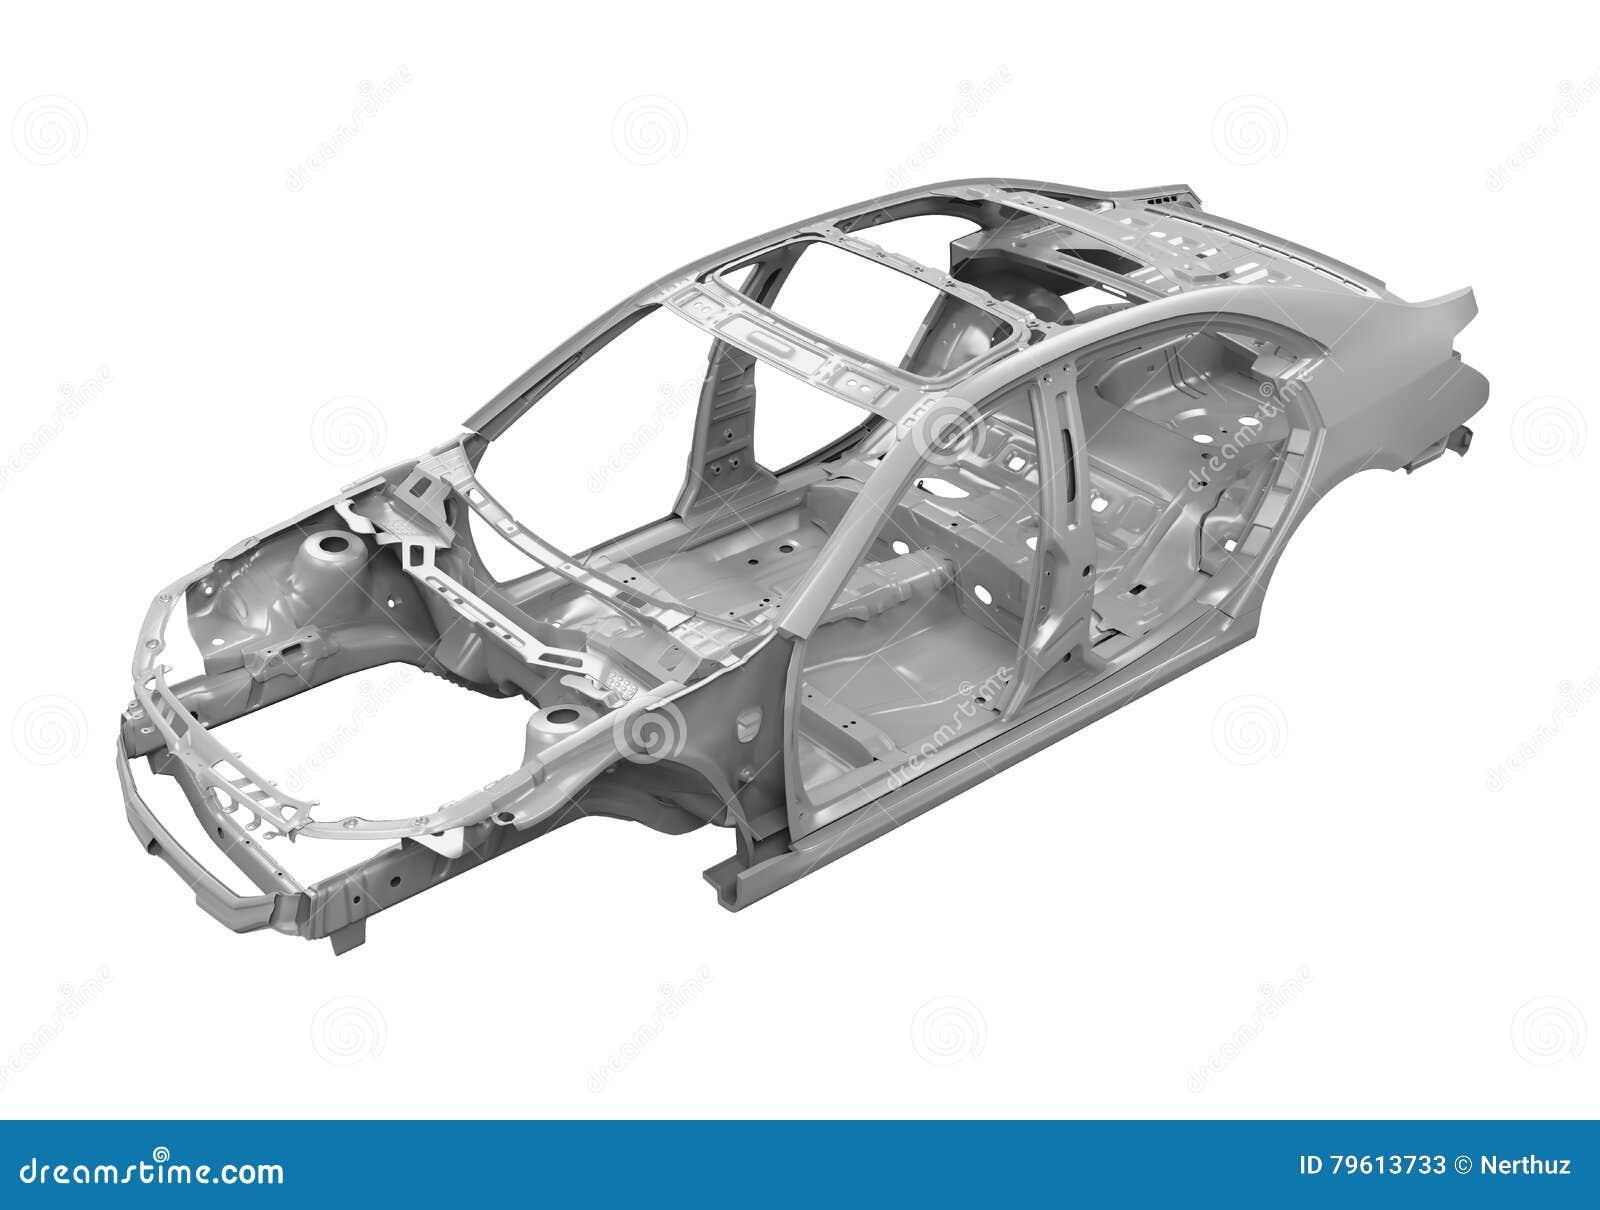 Unibody-Auto-Fahrgestelle